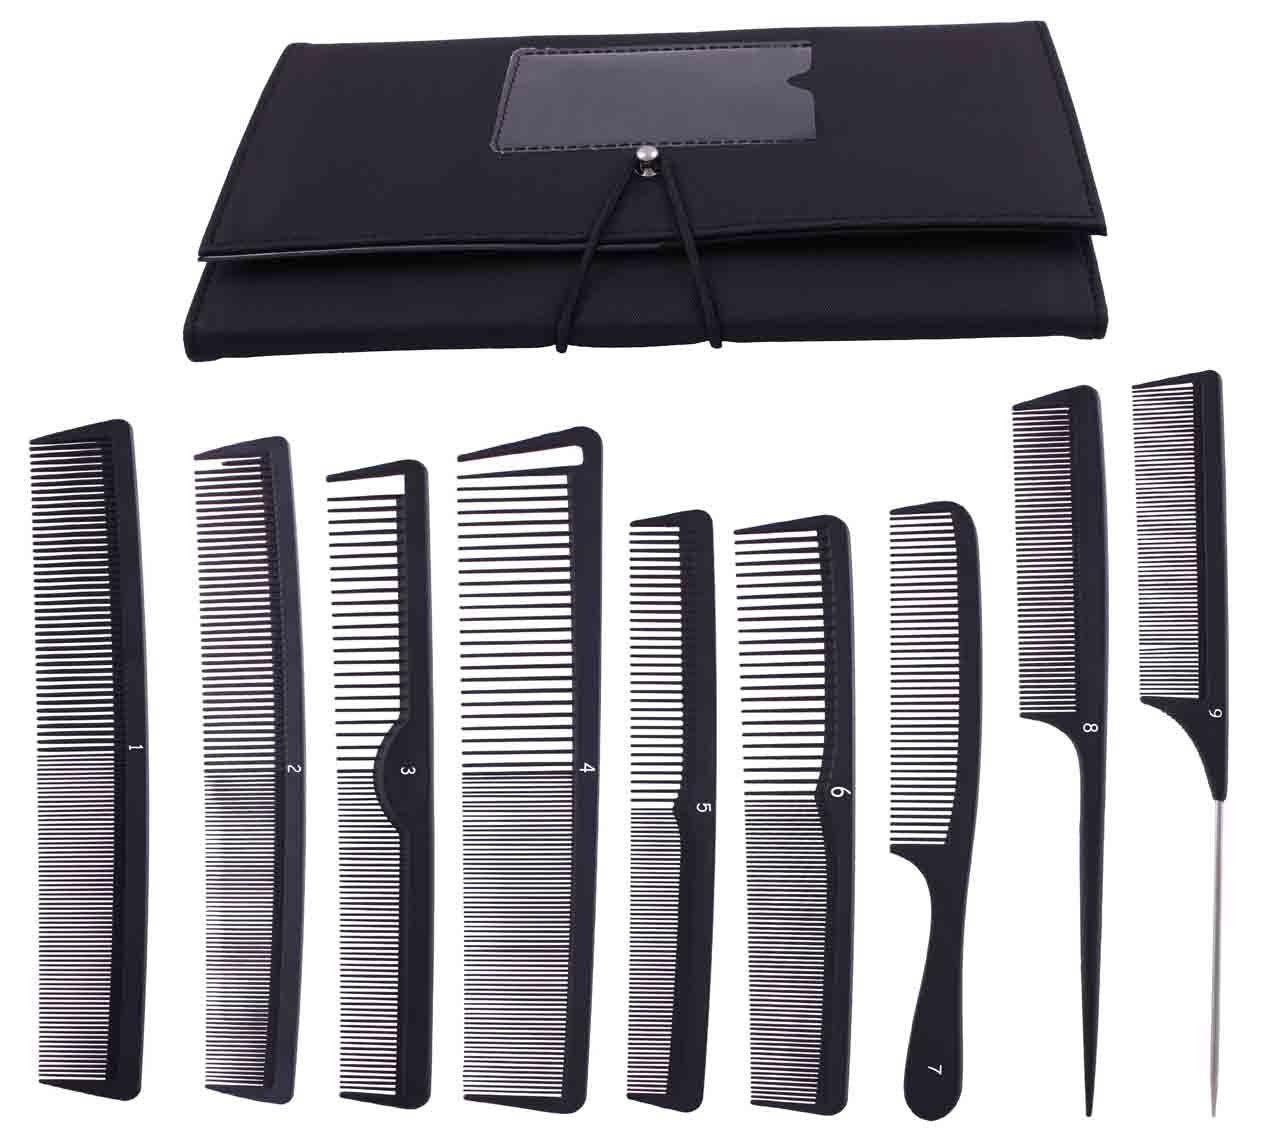 9pcs Professional Salon Hair Cutting Comb Set, Stylist